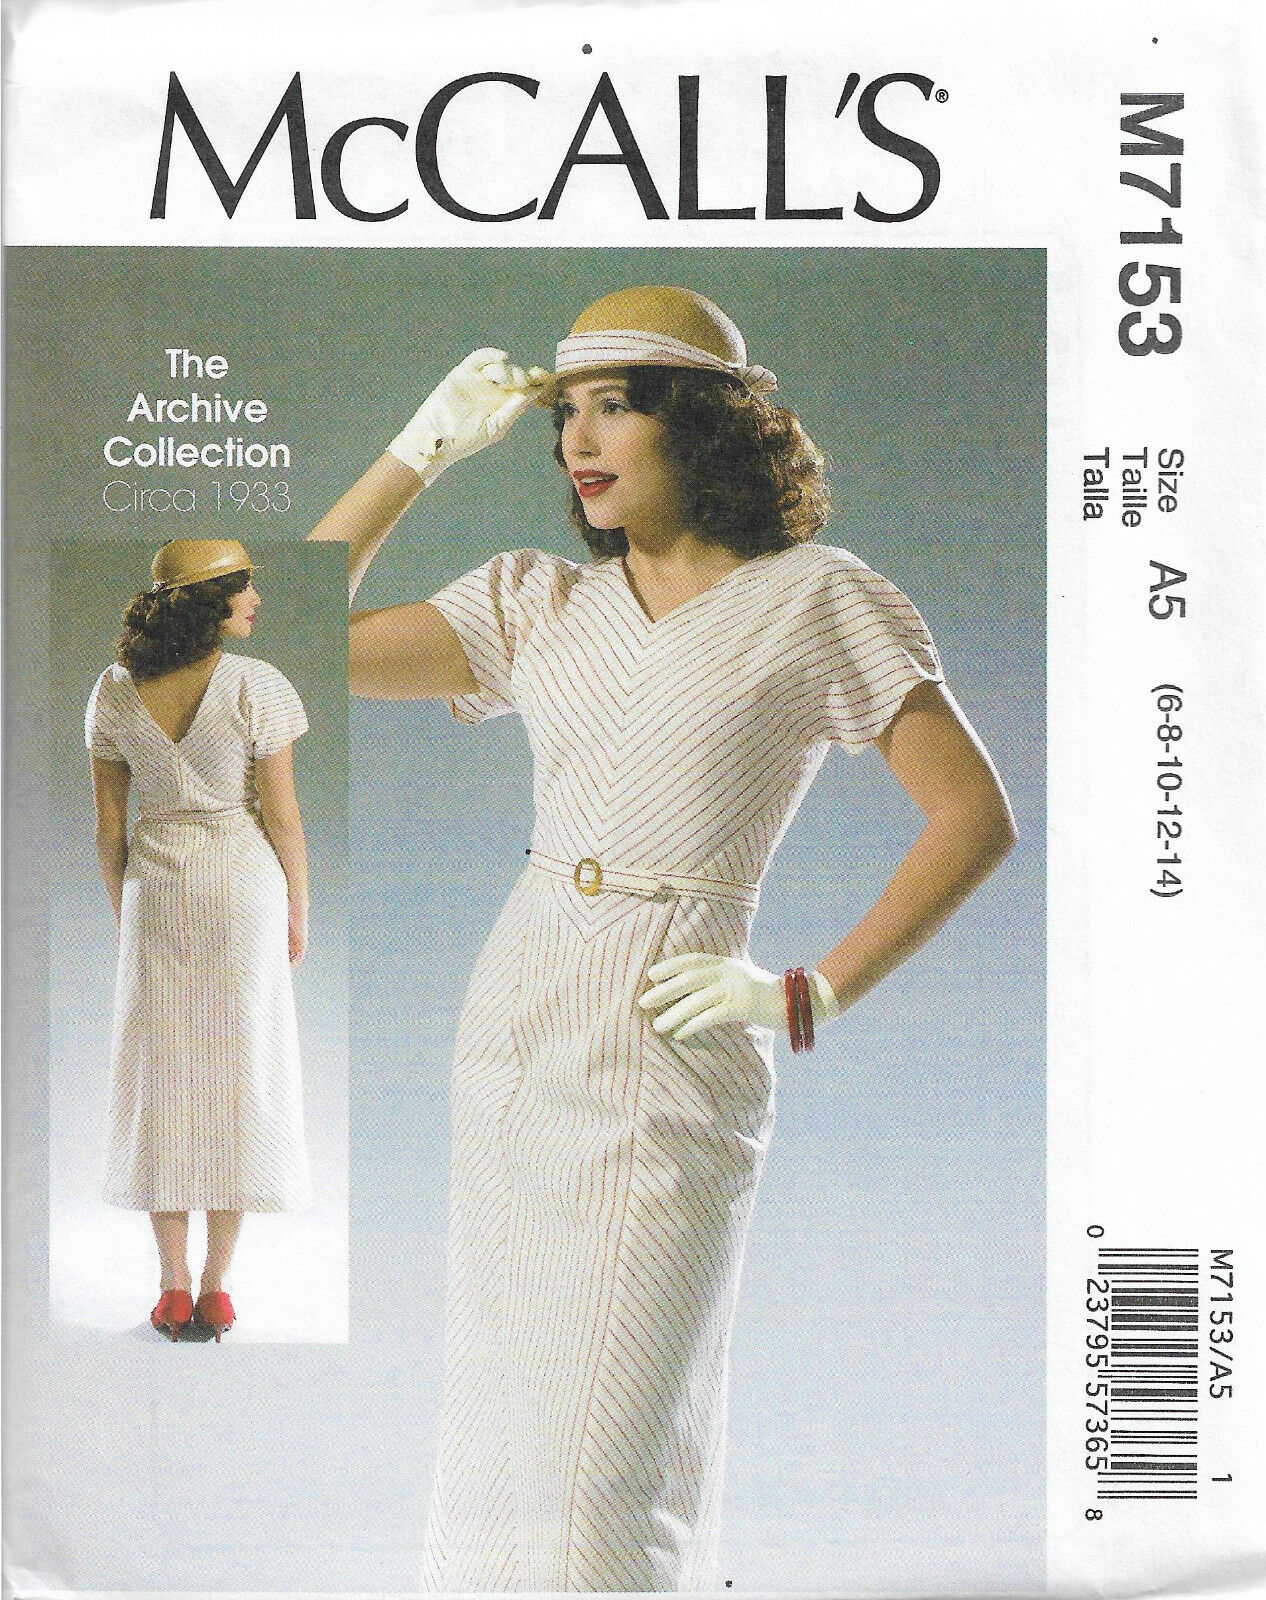 Retro dress SEWING PATTERN, tea dress M7153, 1930s 1940s style ...